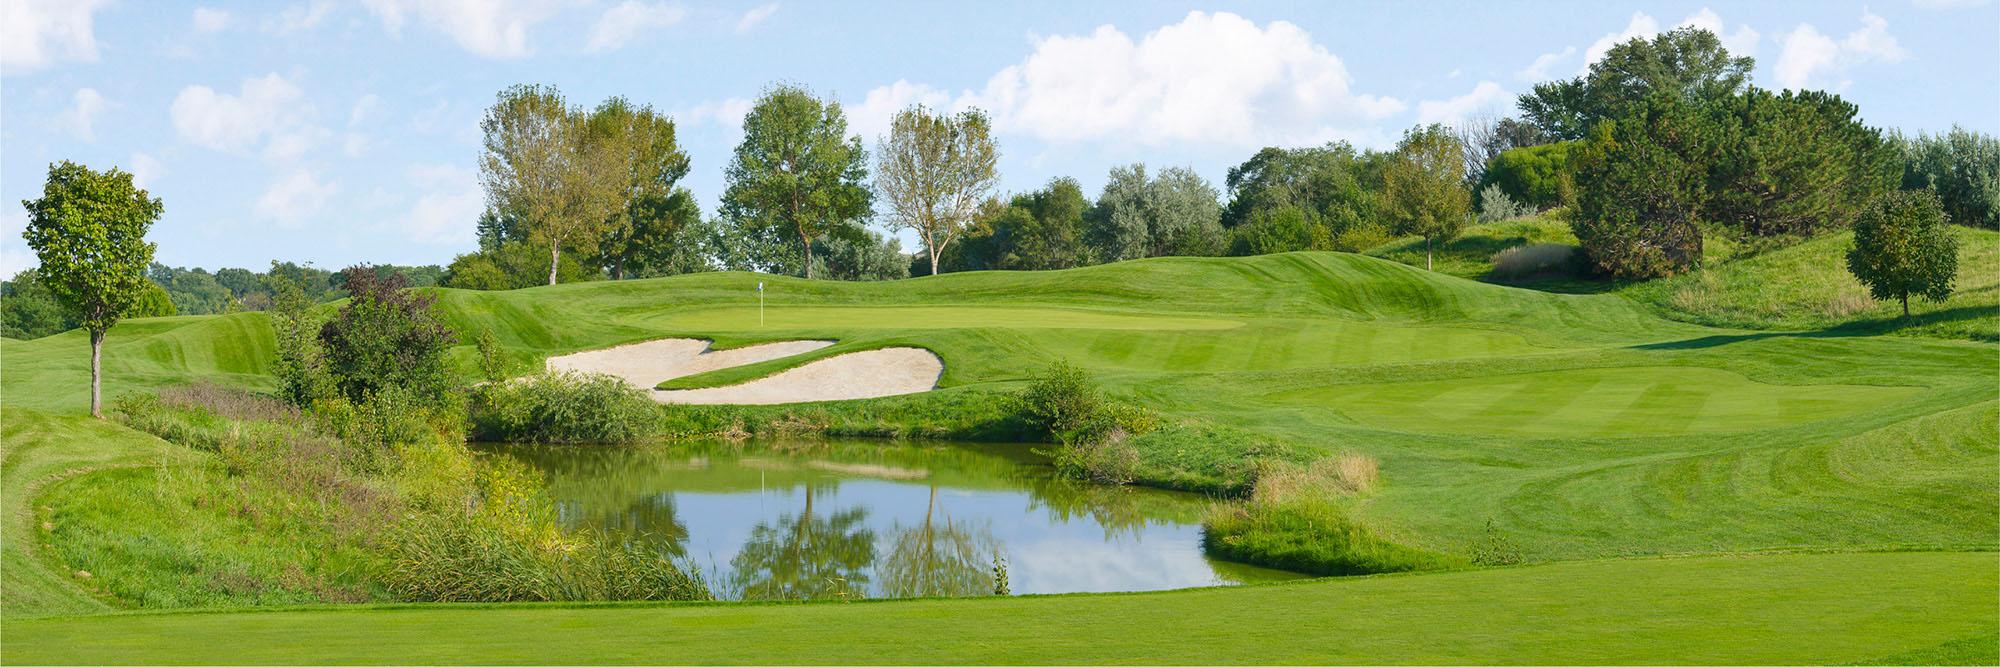 Golf Course Image - Champions Run No. 8